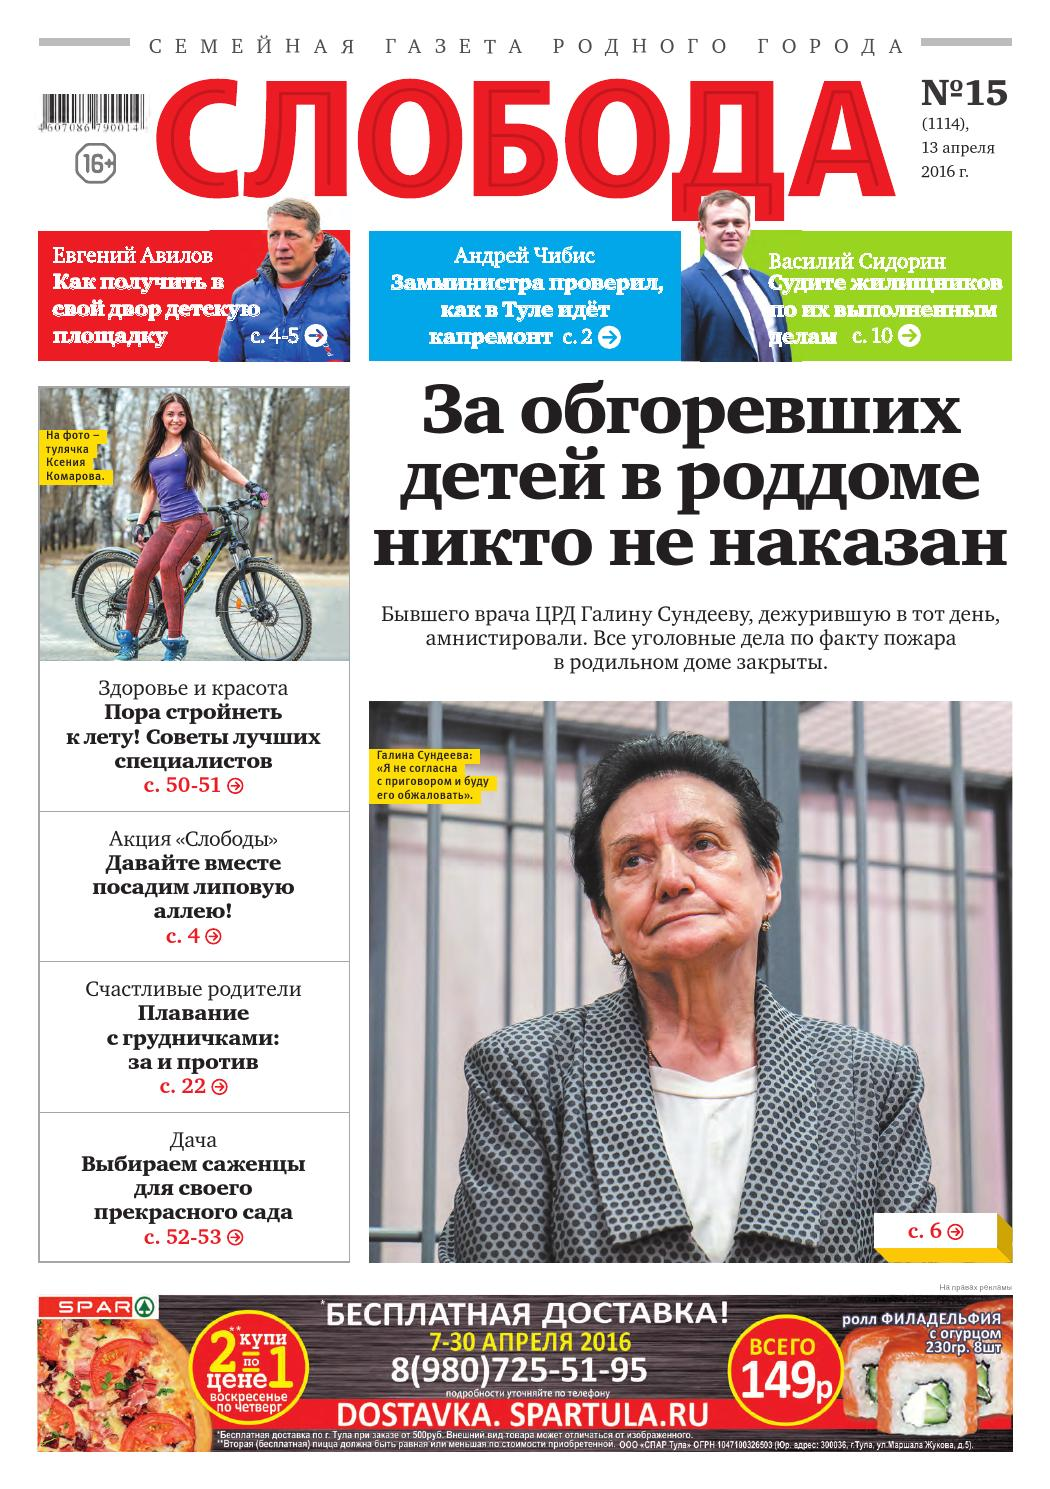 ef5968b5396b Слобода №15 (1114)  За обгоревших детей в роддоме никто не наказан by  Газета